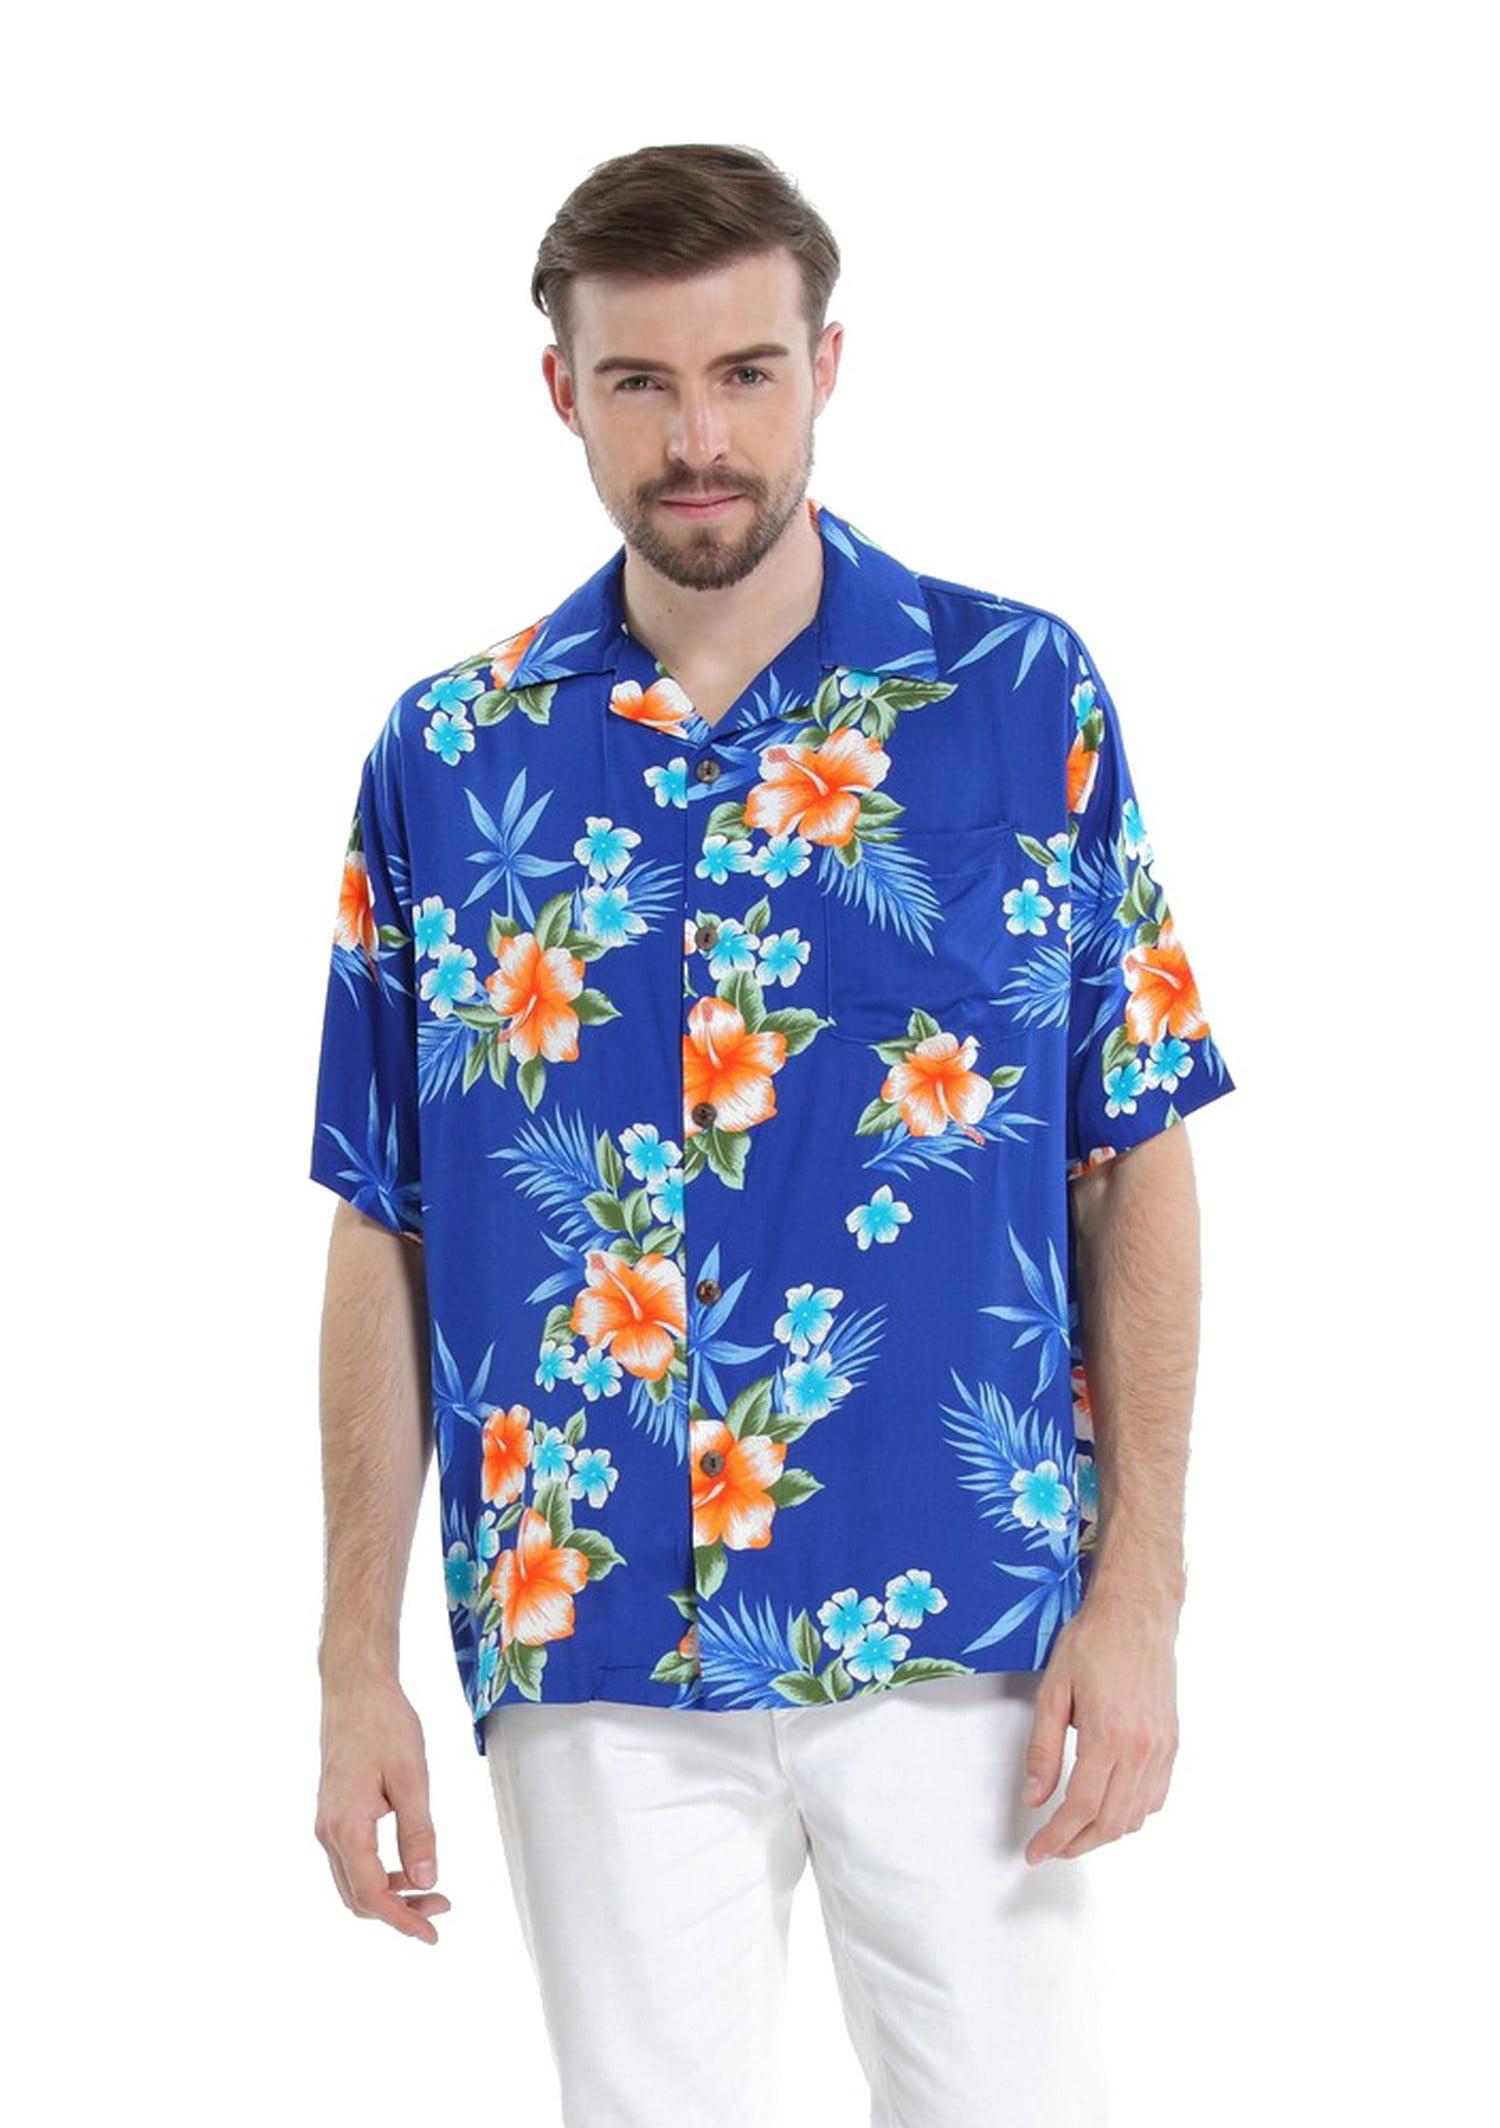 385c8dcc5ad1 Hawaii Hangover - Matching Father Daughter Hawaiian Luau Cruise Outfit  Shirt Dress Hibiscus Black Men 2XL Girl 14 - Walmart.com